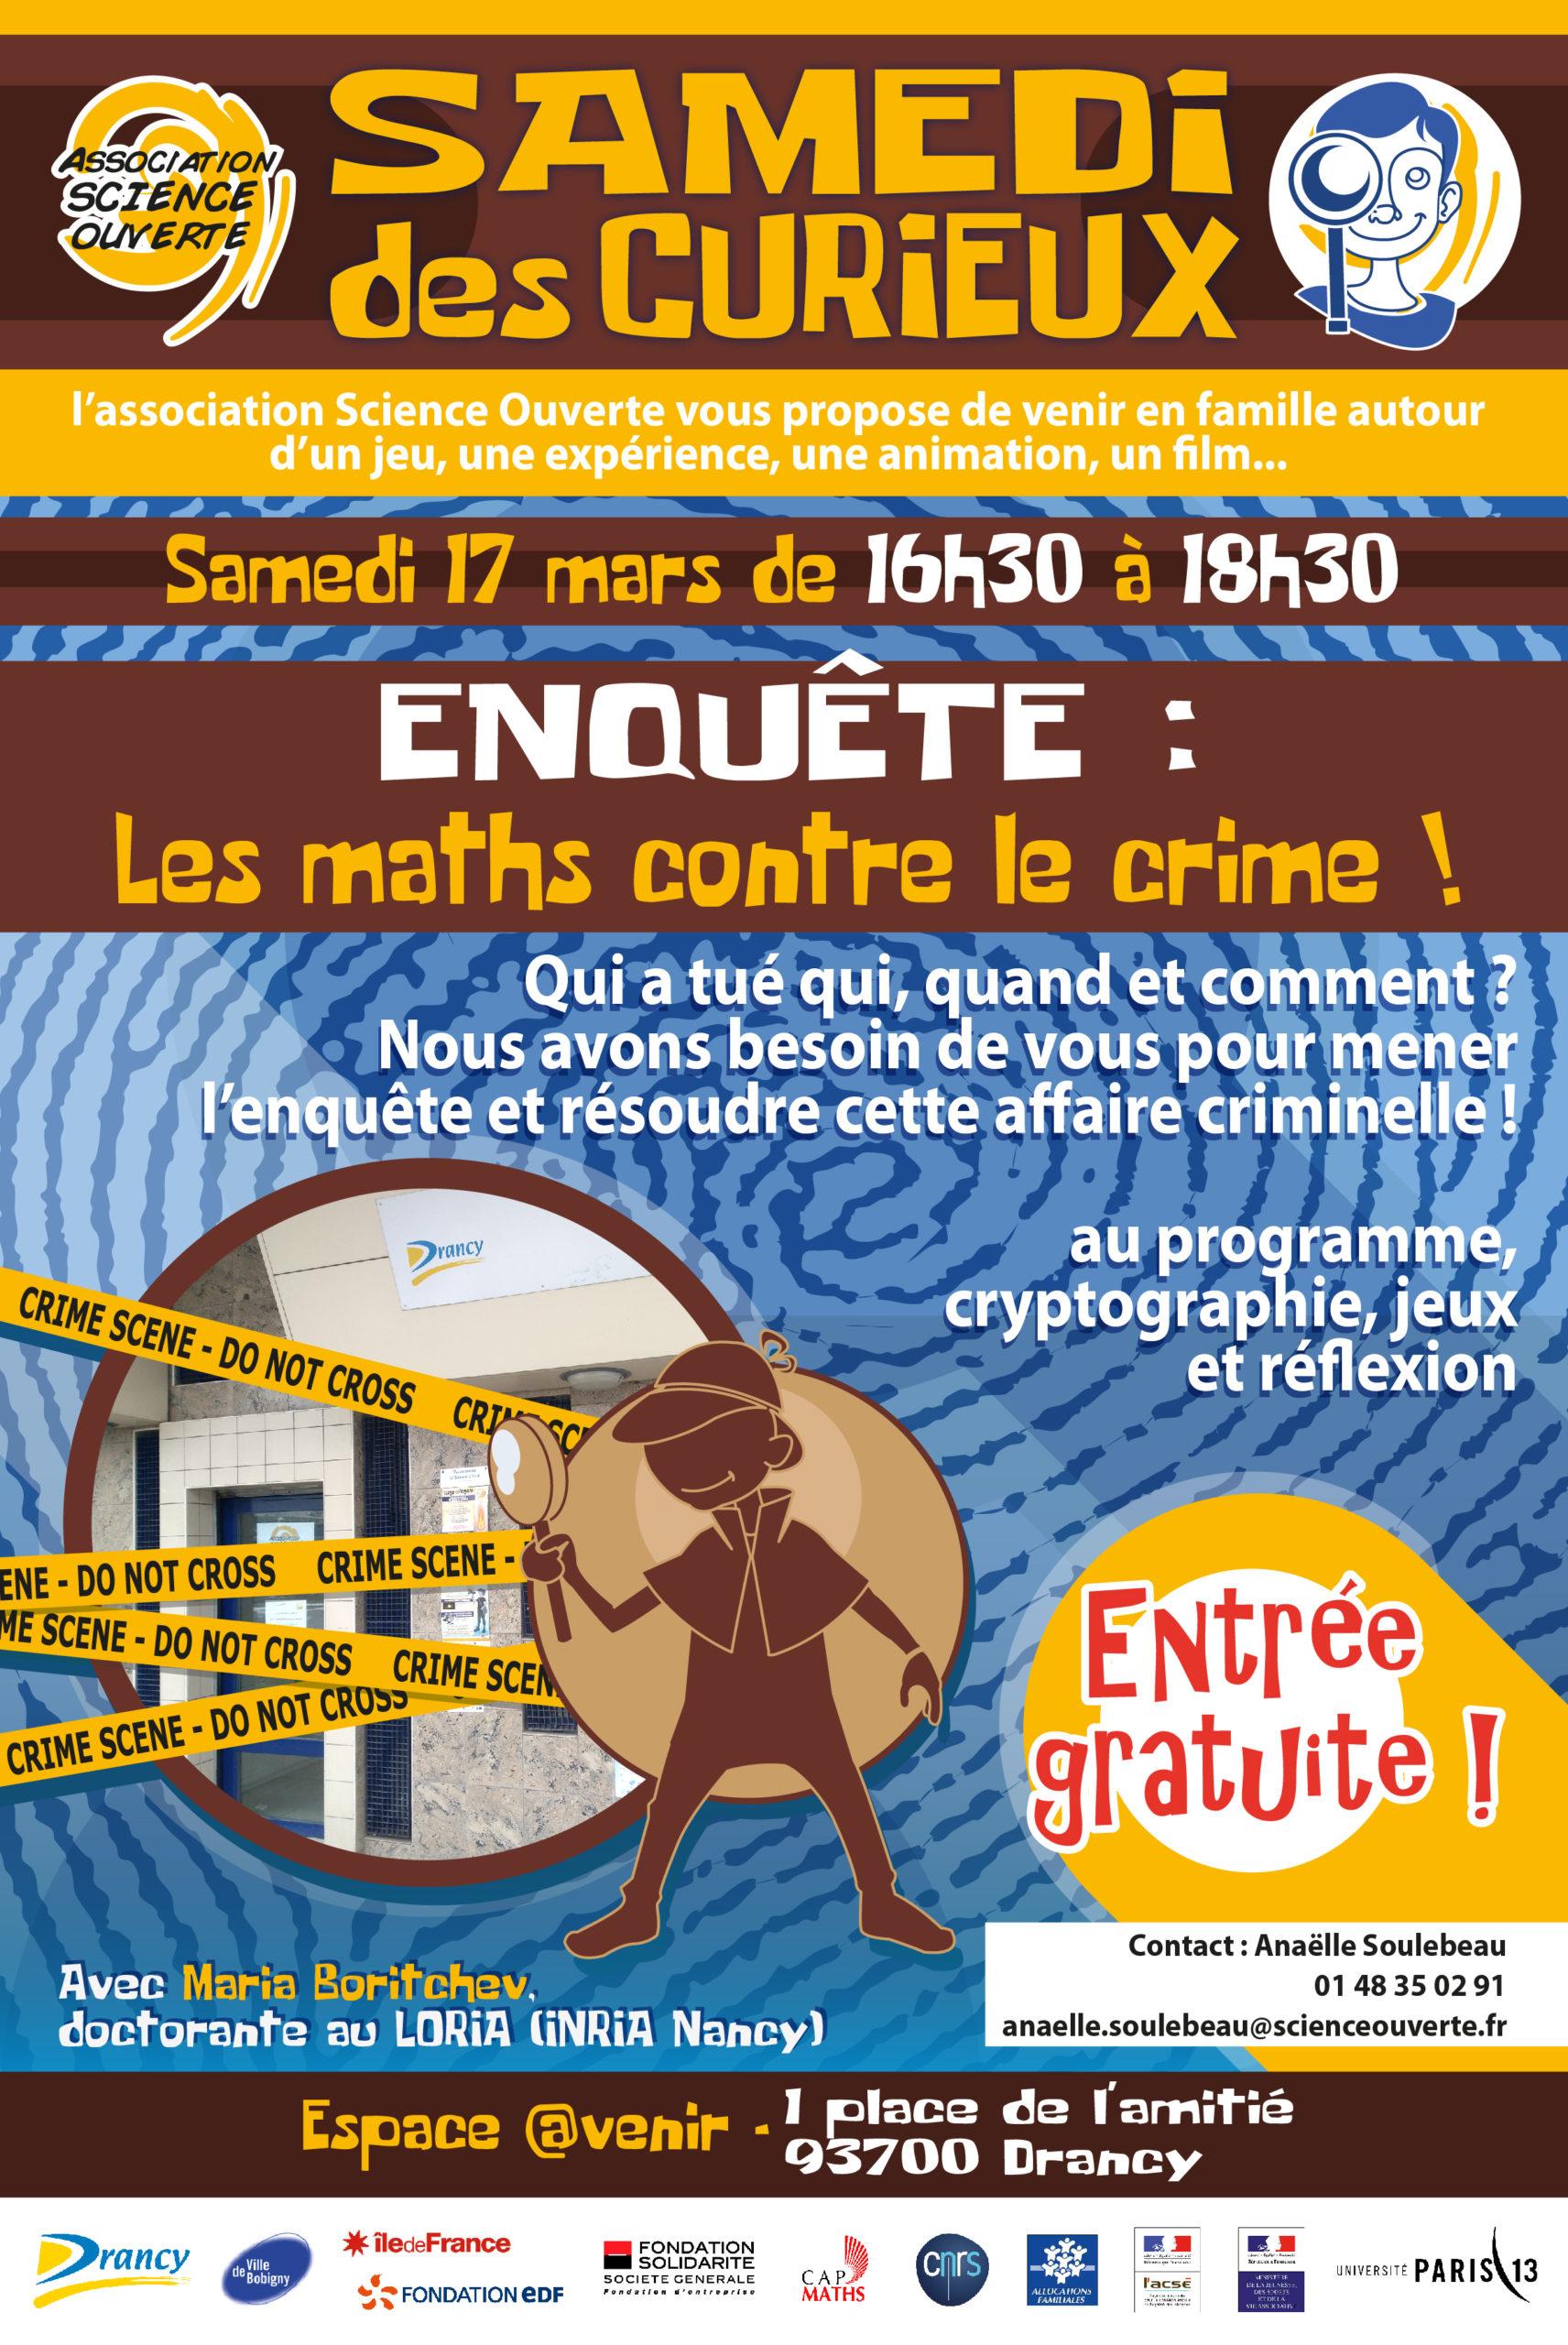 samedicurieux_enquete_affiche-01.jpg